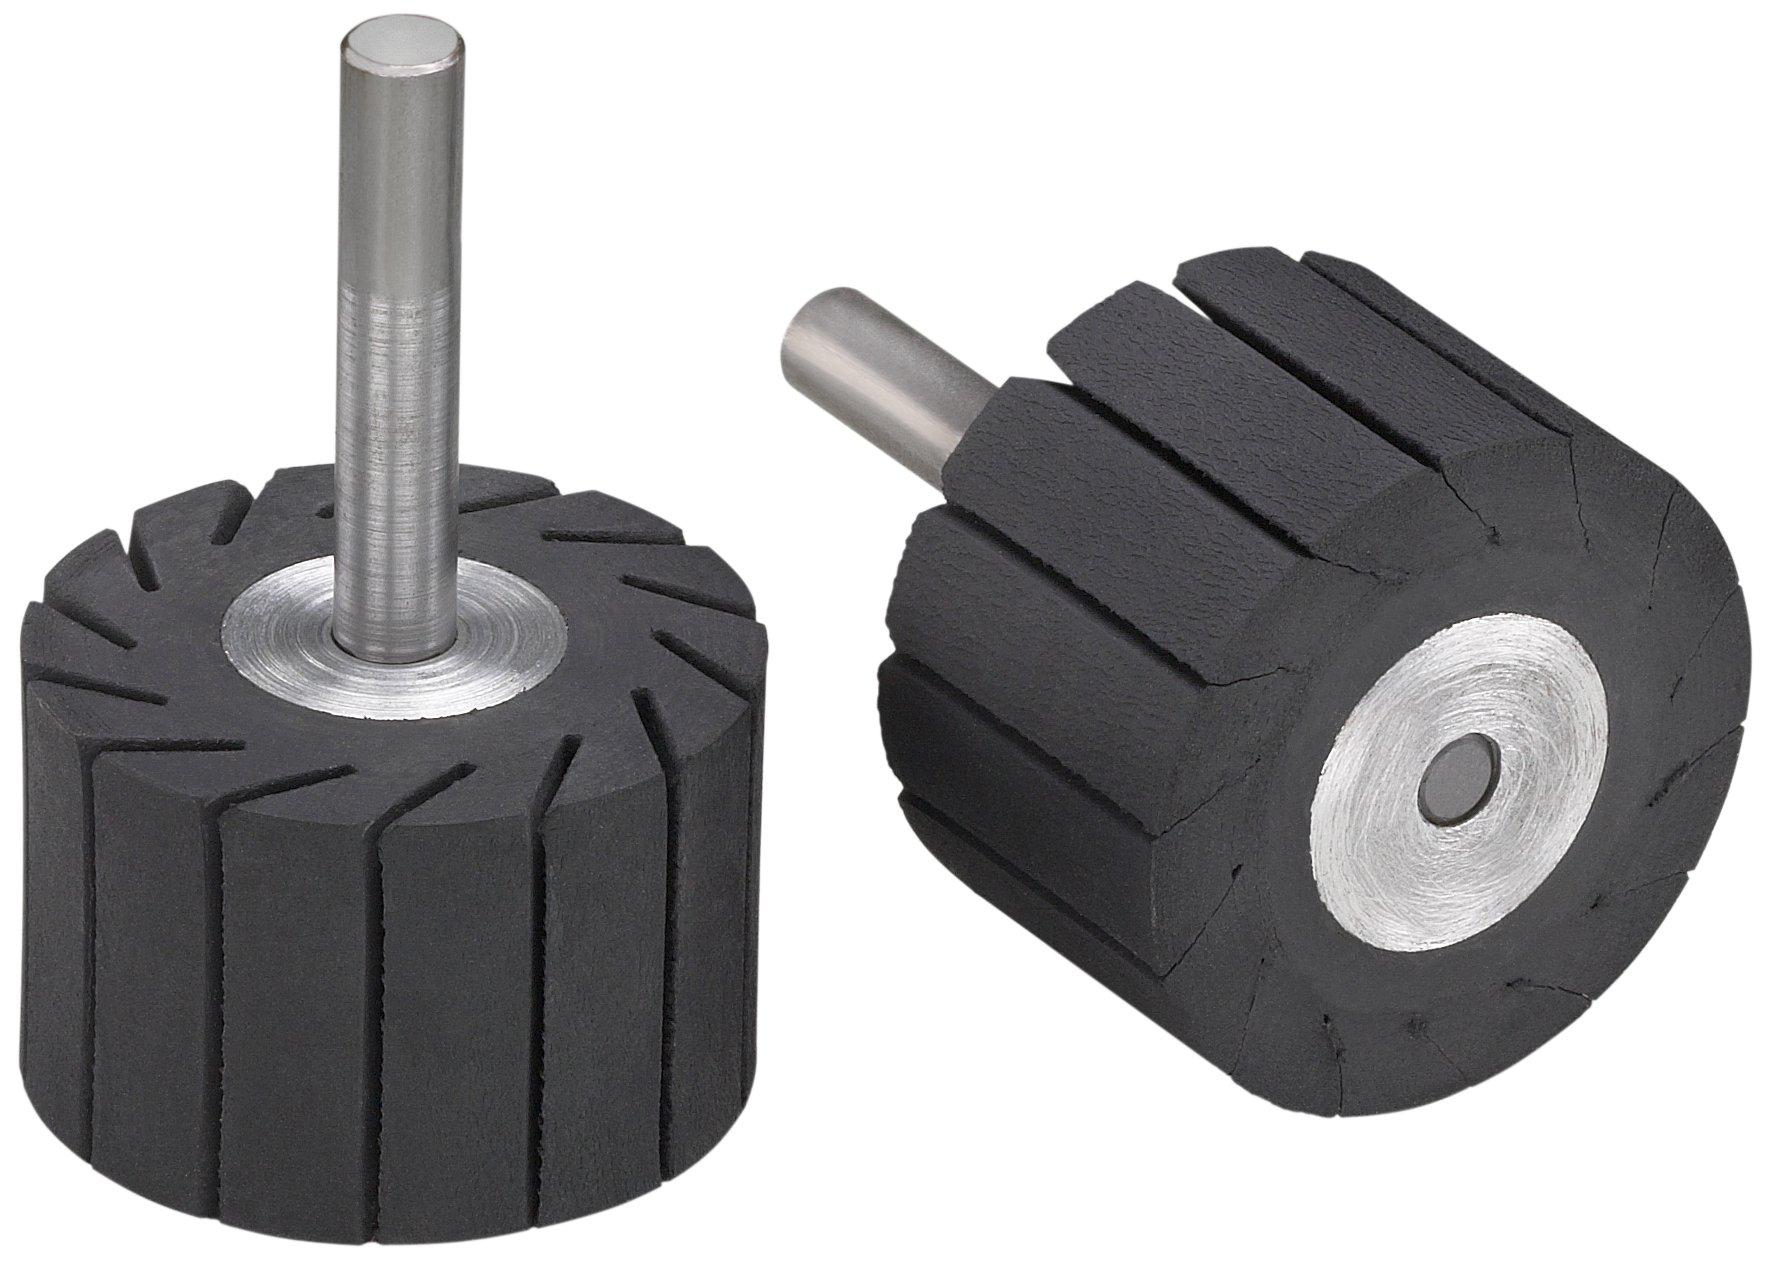 3M(TM) Rubber Slotted Expander Wheel 77718, Expanding Drum, 1-1/2'' Diameter x 1'' Width, 1/4'' Shank, 14000 rpm, Black (Pack of 1)